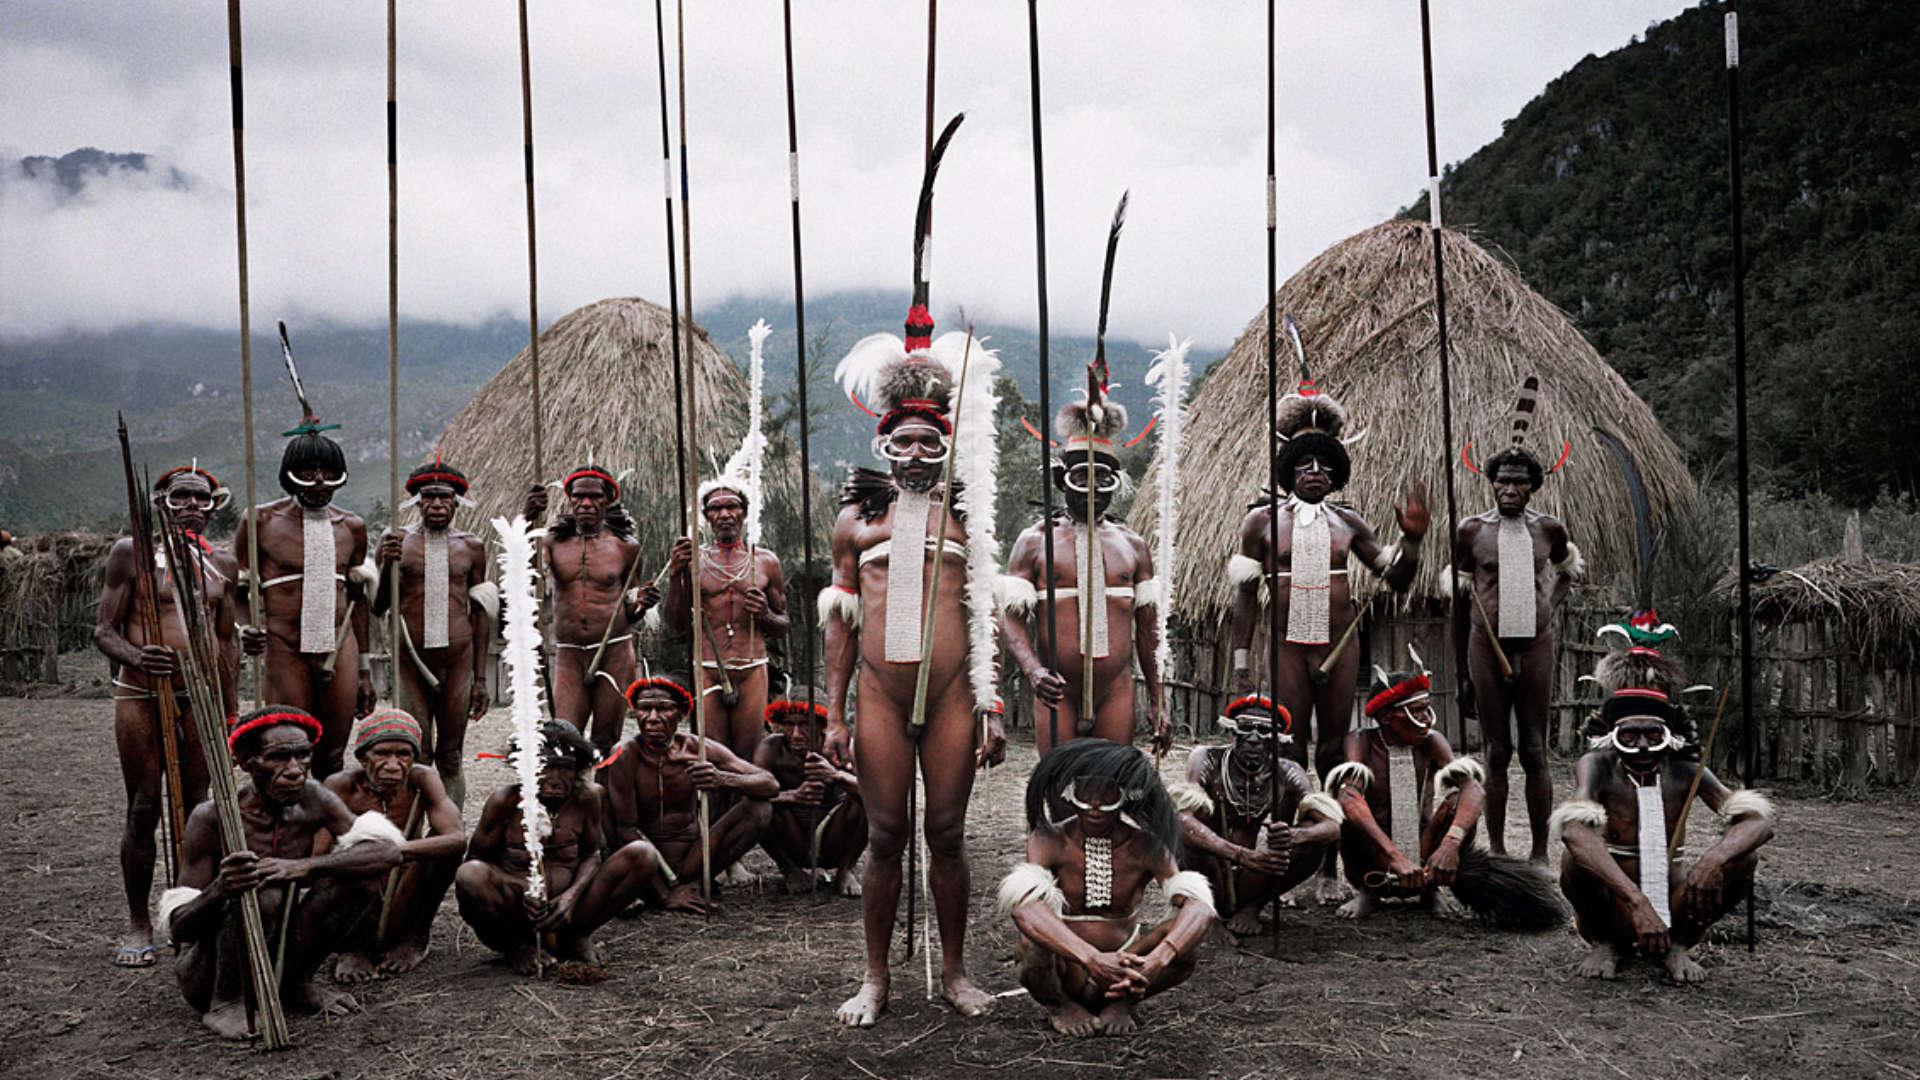 Dani stam, Yetni, Papoea-Nieuw-Guinea